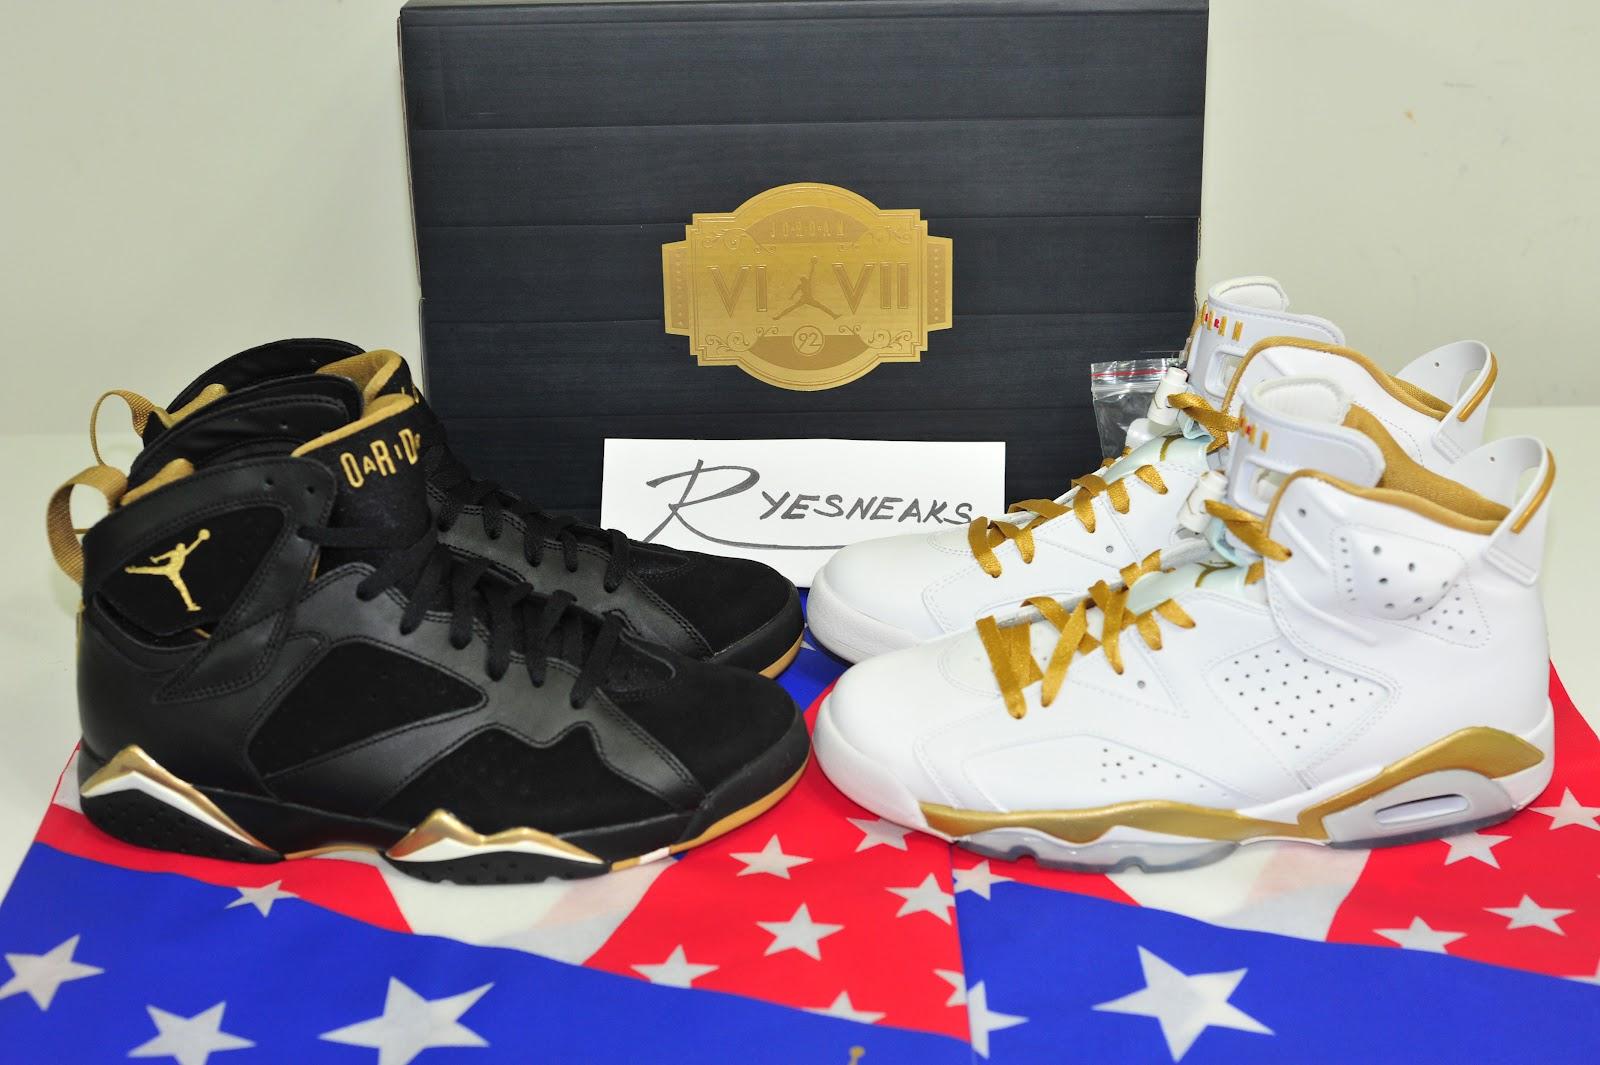 hot sale online 8f568 6b39c Air Jordan VI VII  Golden Moments Pack Multi-Color Multi-Color 535357-935  08 18 12. Retail   350